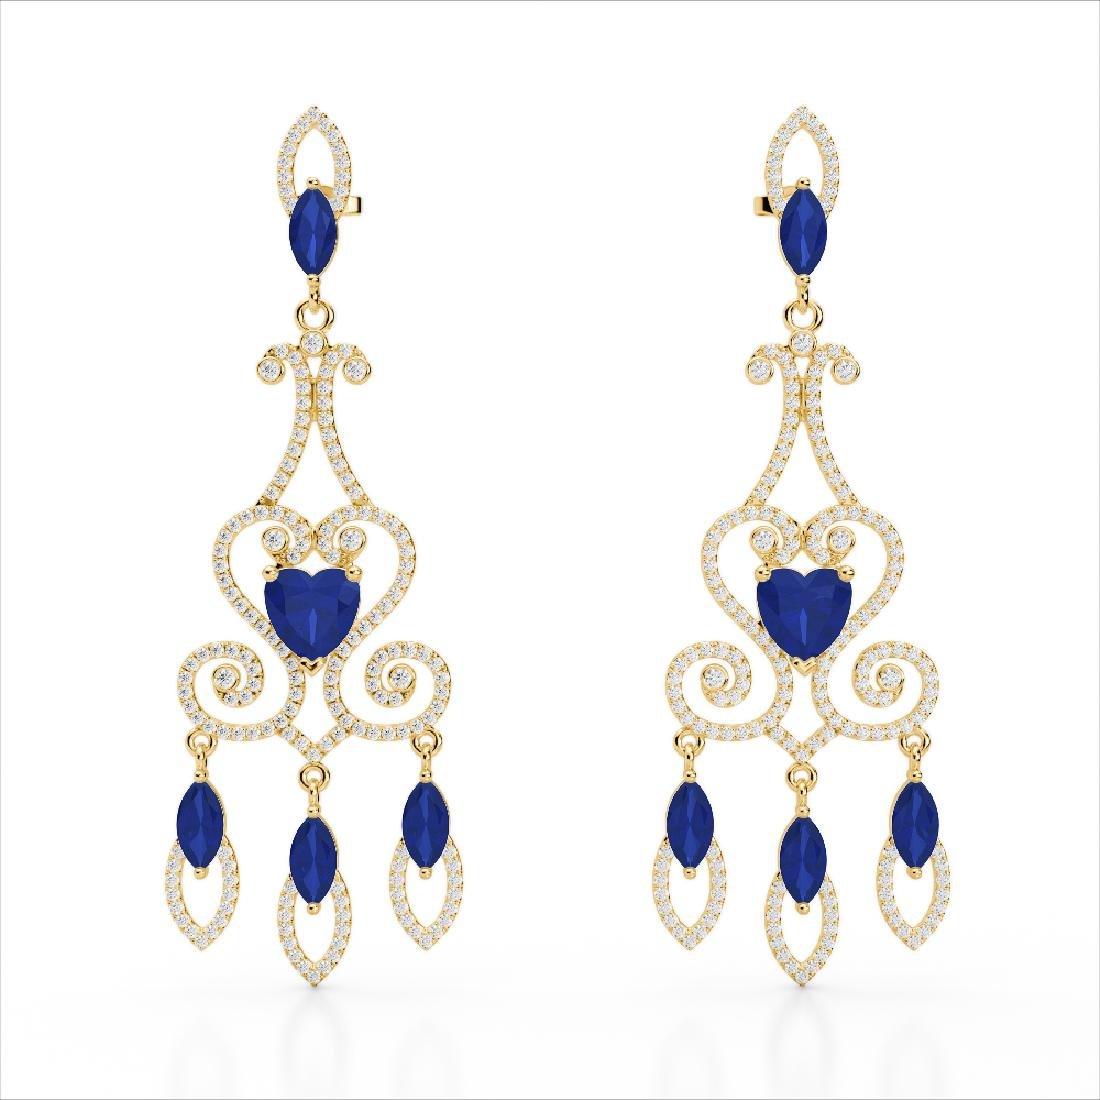 11 CTW Sapphire & Micro Pave VS/SI Diamond Earrings 14K - 2